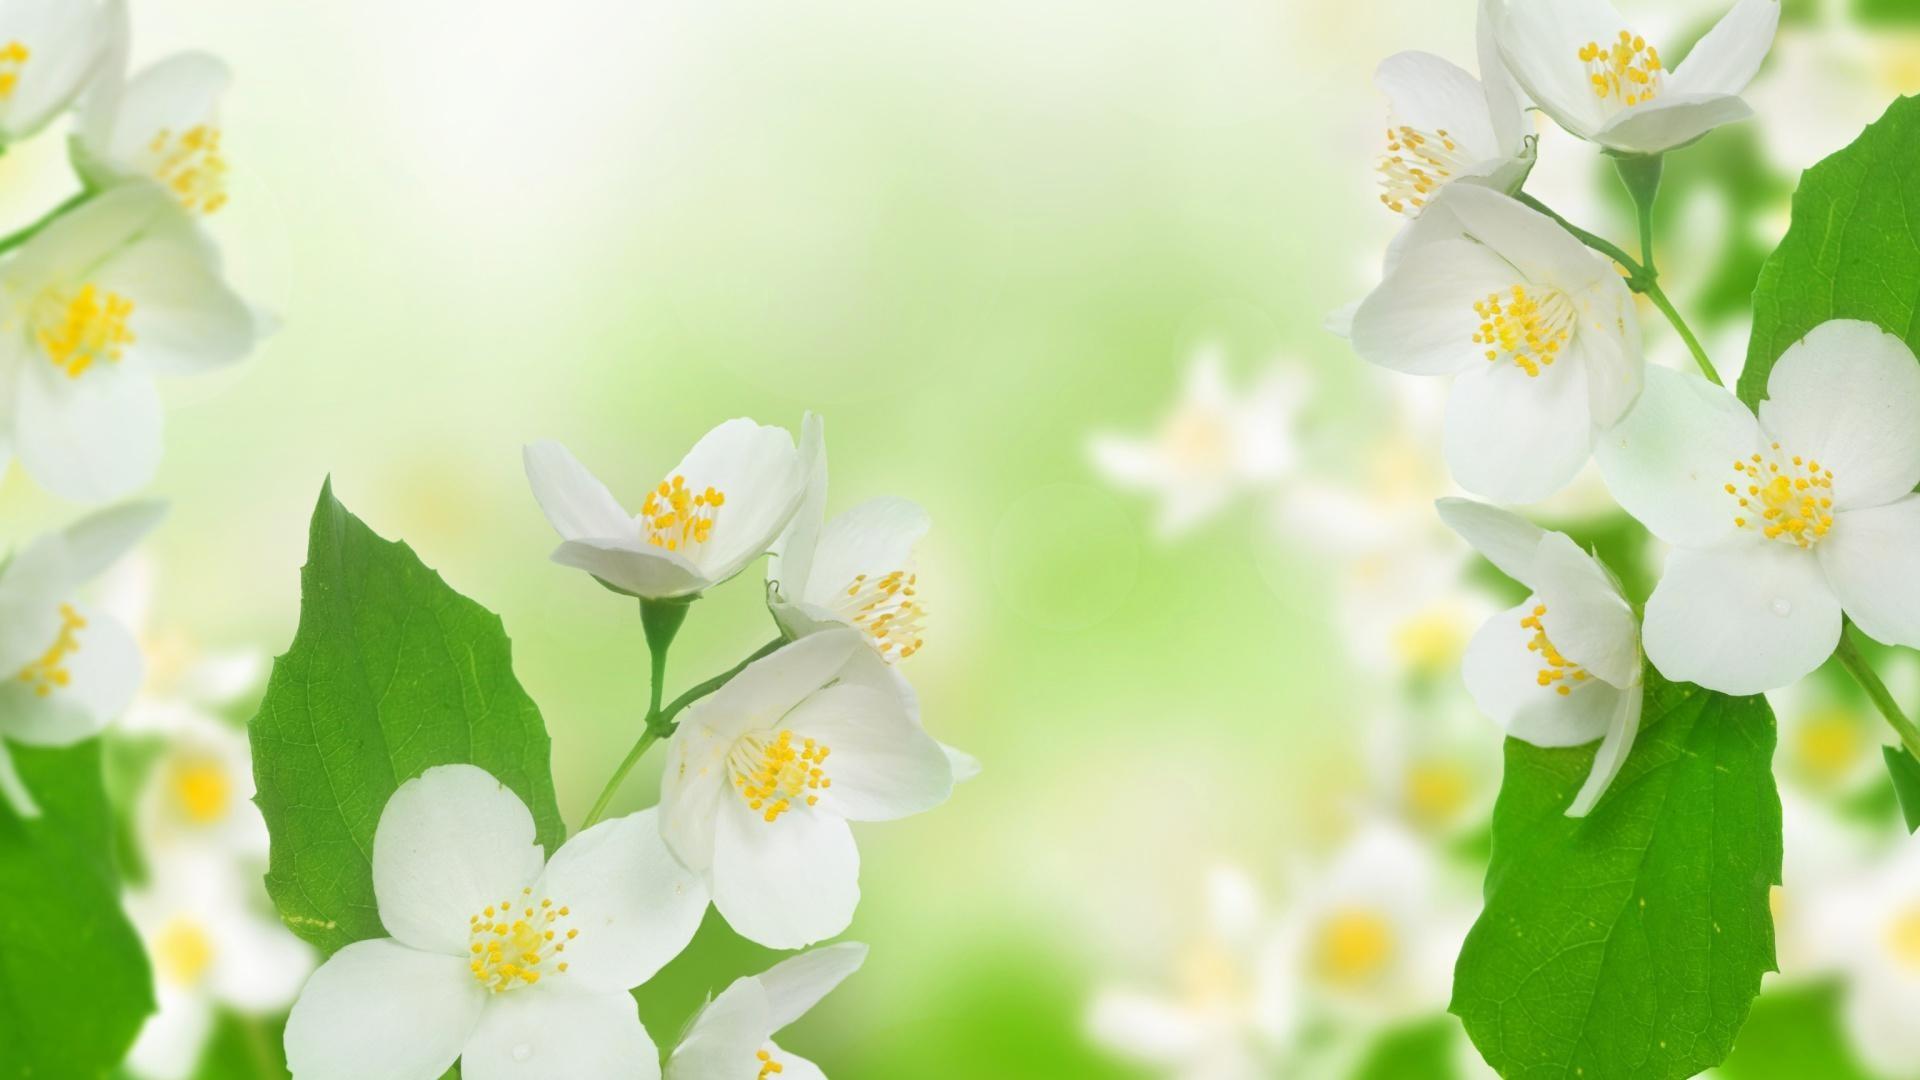 Jasmine flower wallpaper - Flower wallpaper movie ...